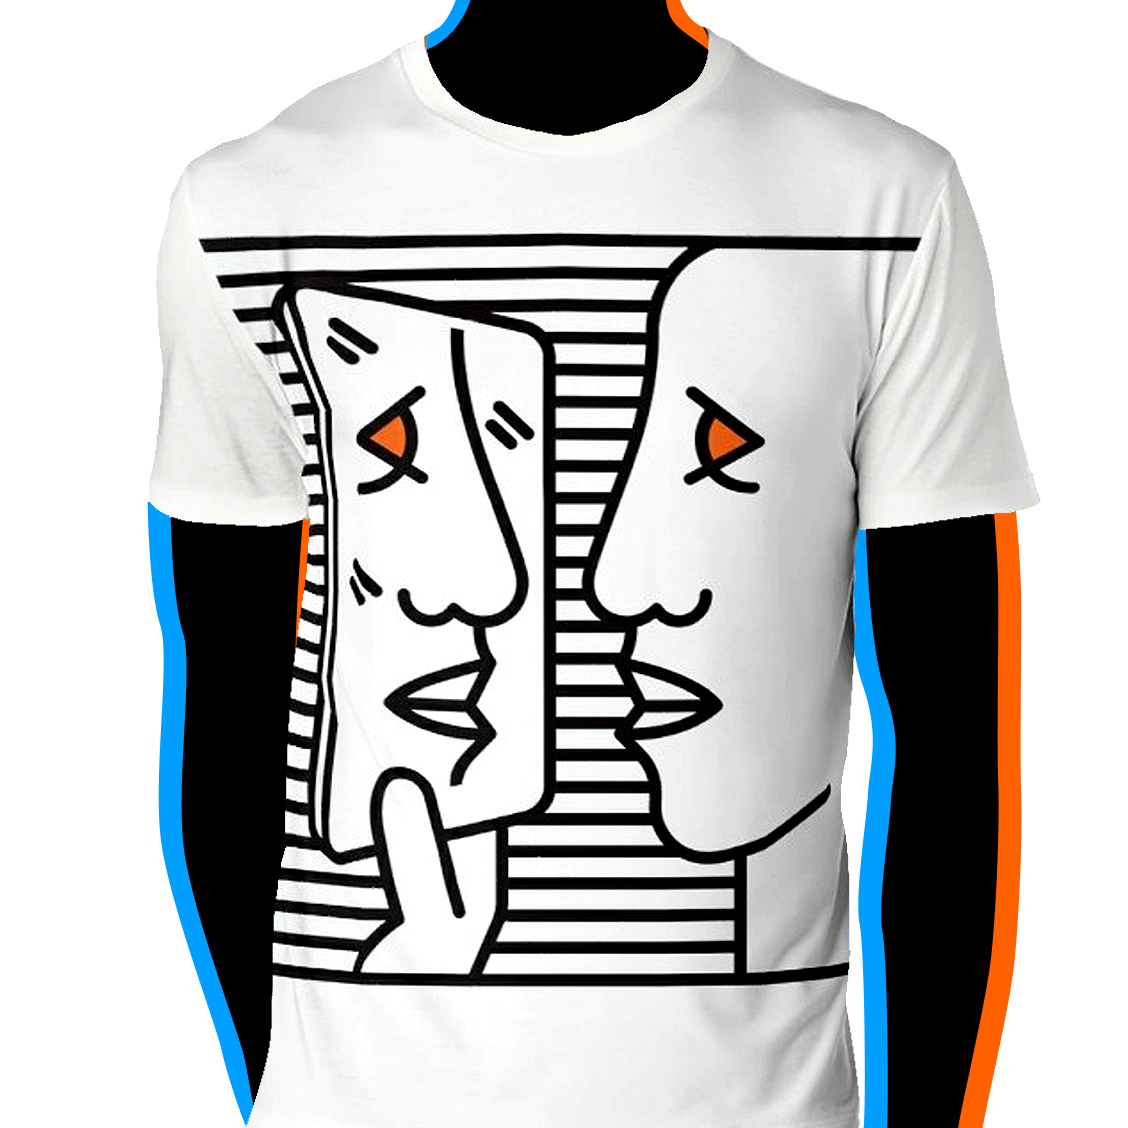 T-Shirt_CheckYoSelfie.jpg